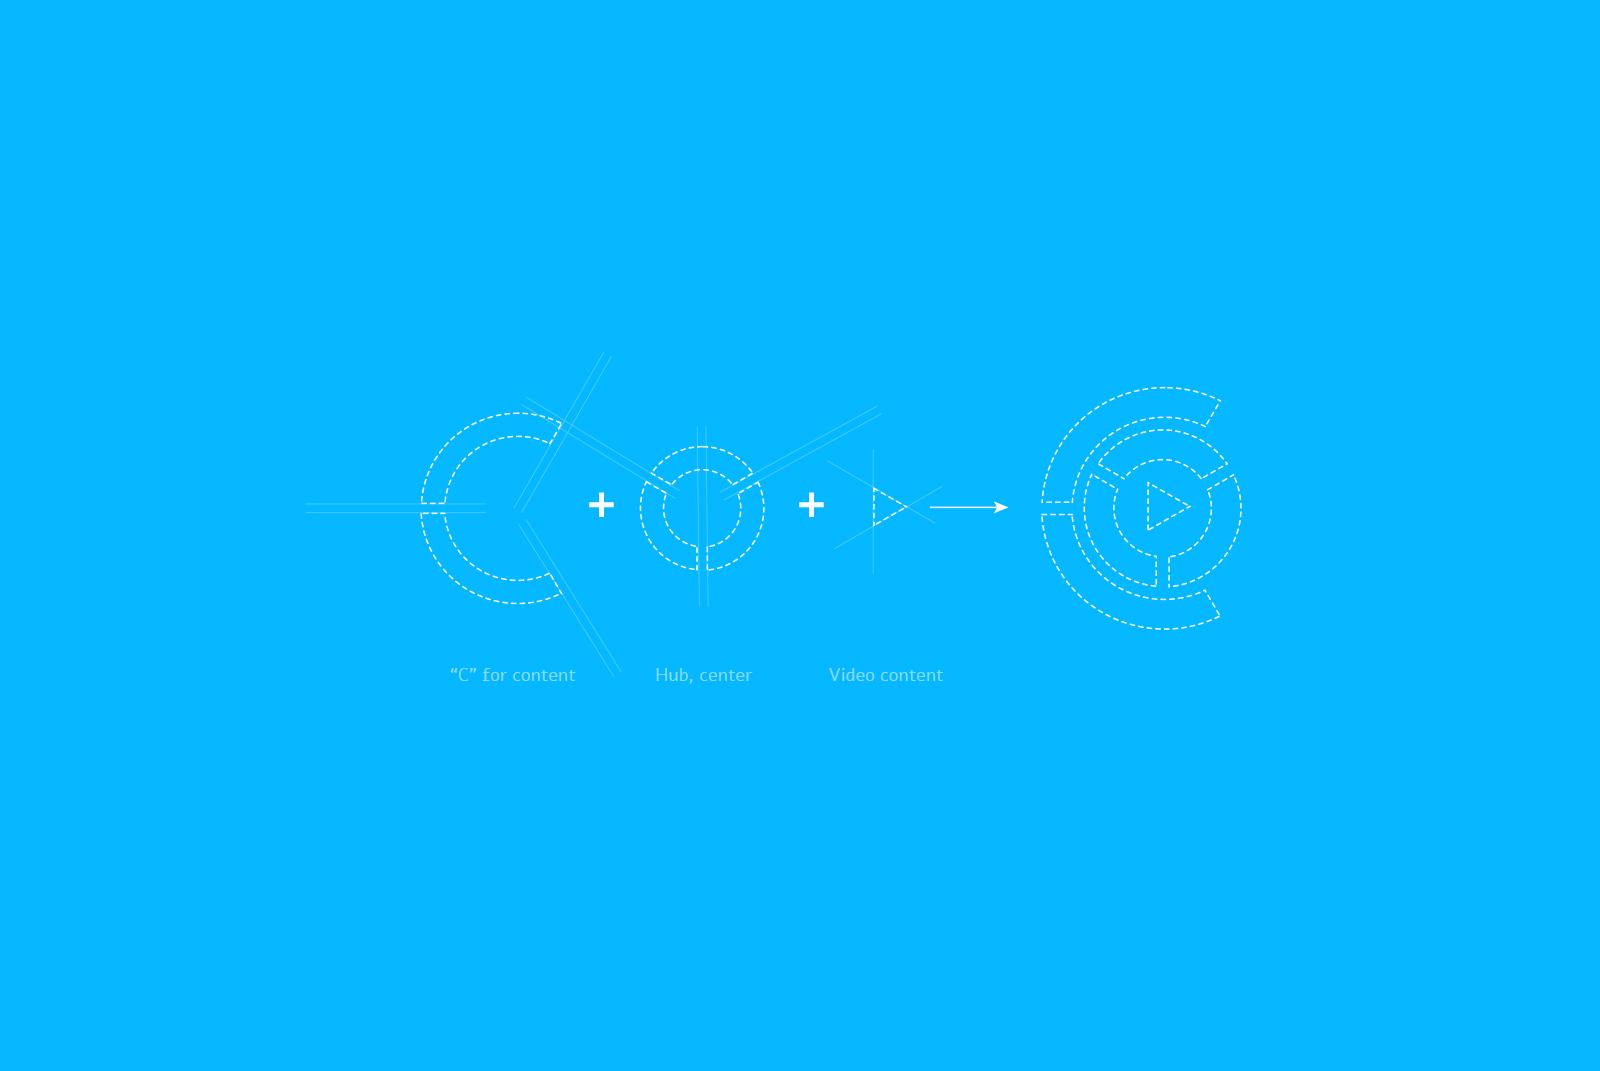 Logo creation process content hub Herzeliya תהליך יצירת לוגו חממת התוכן הבינתחומי הרצליה